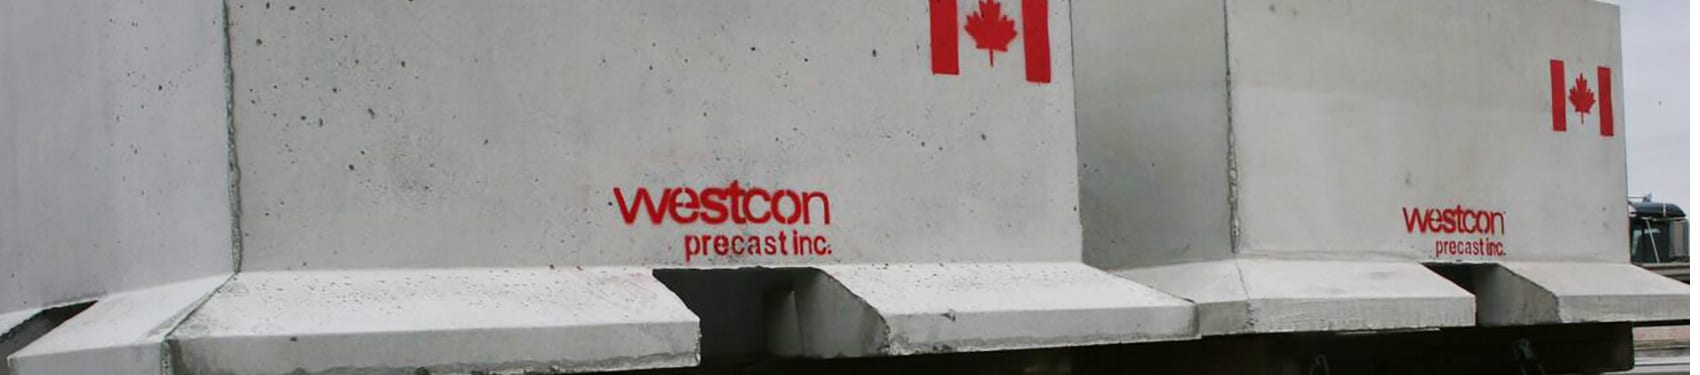 Precast Concrete Vaults | Westcon Precast Alberta